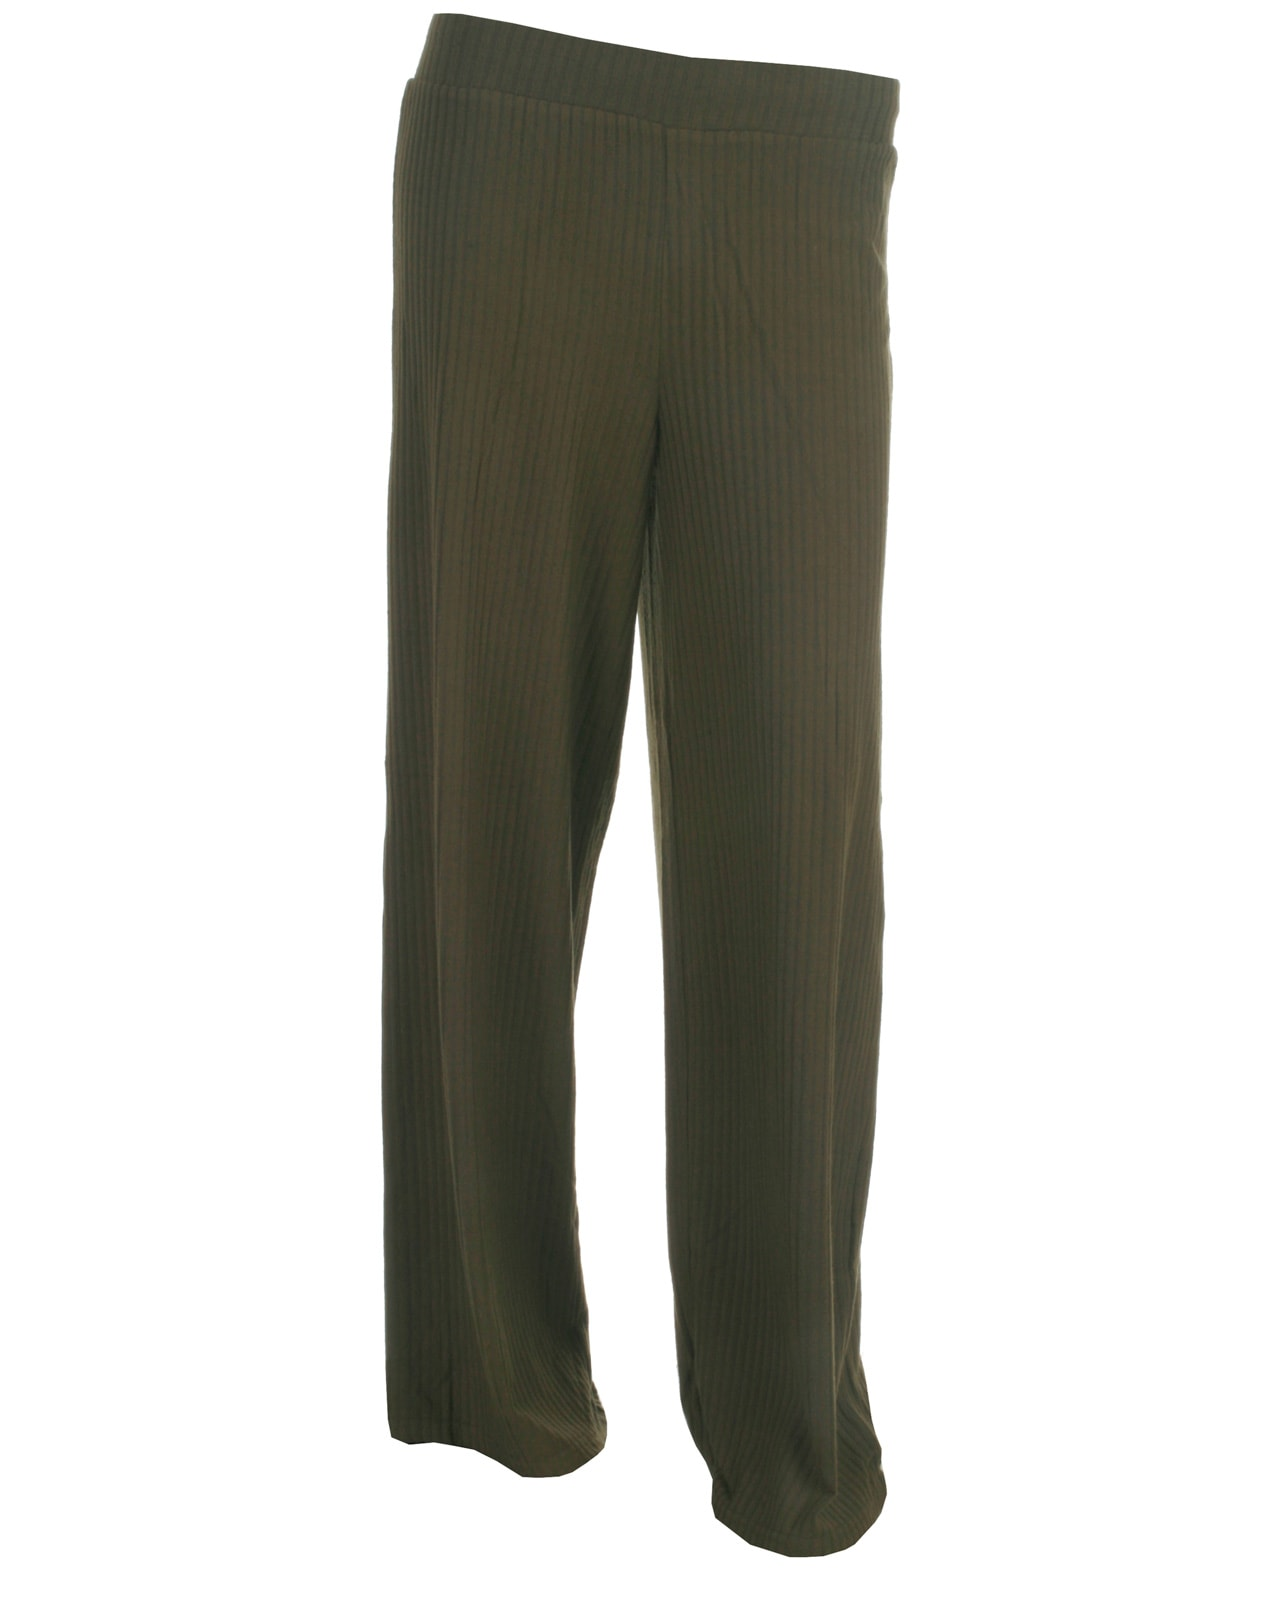 Image of LMTD wide pant, Romina, ivygreen